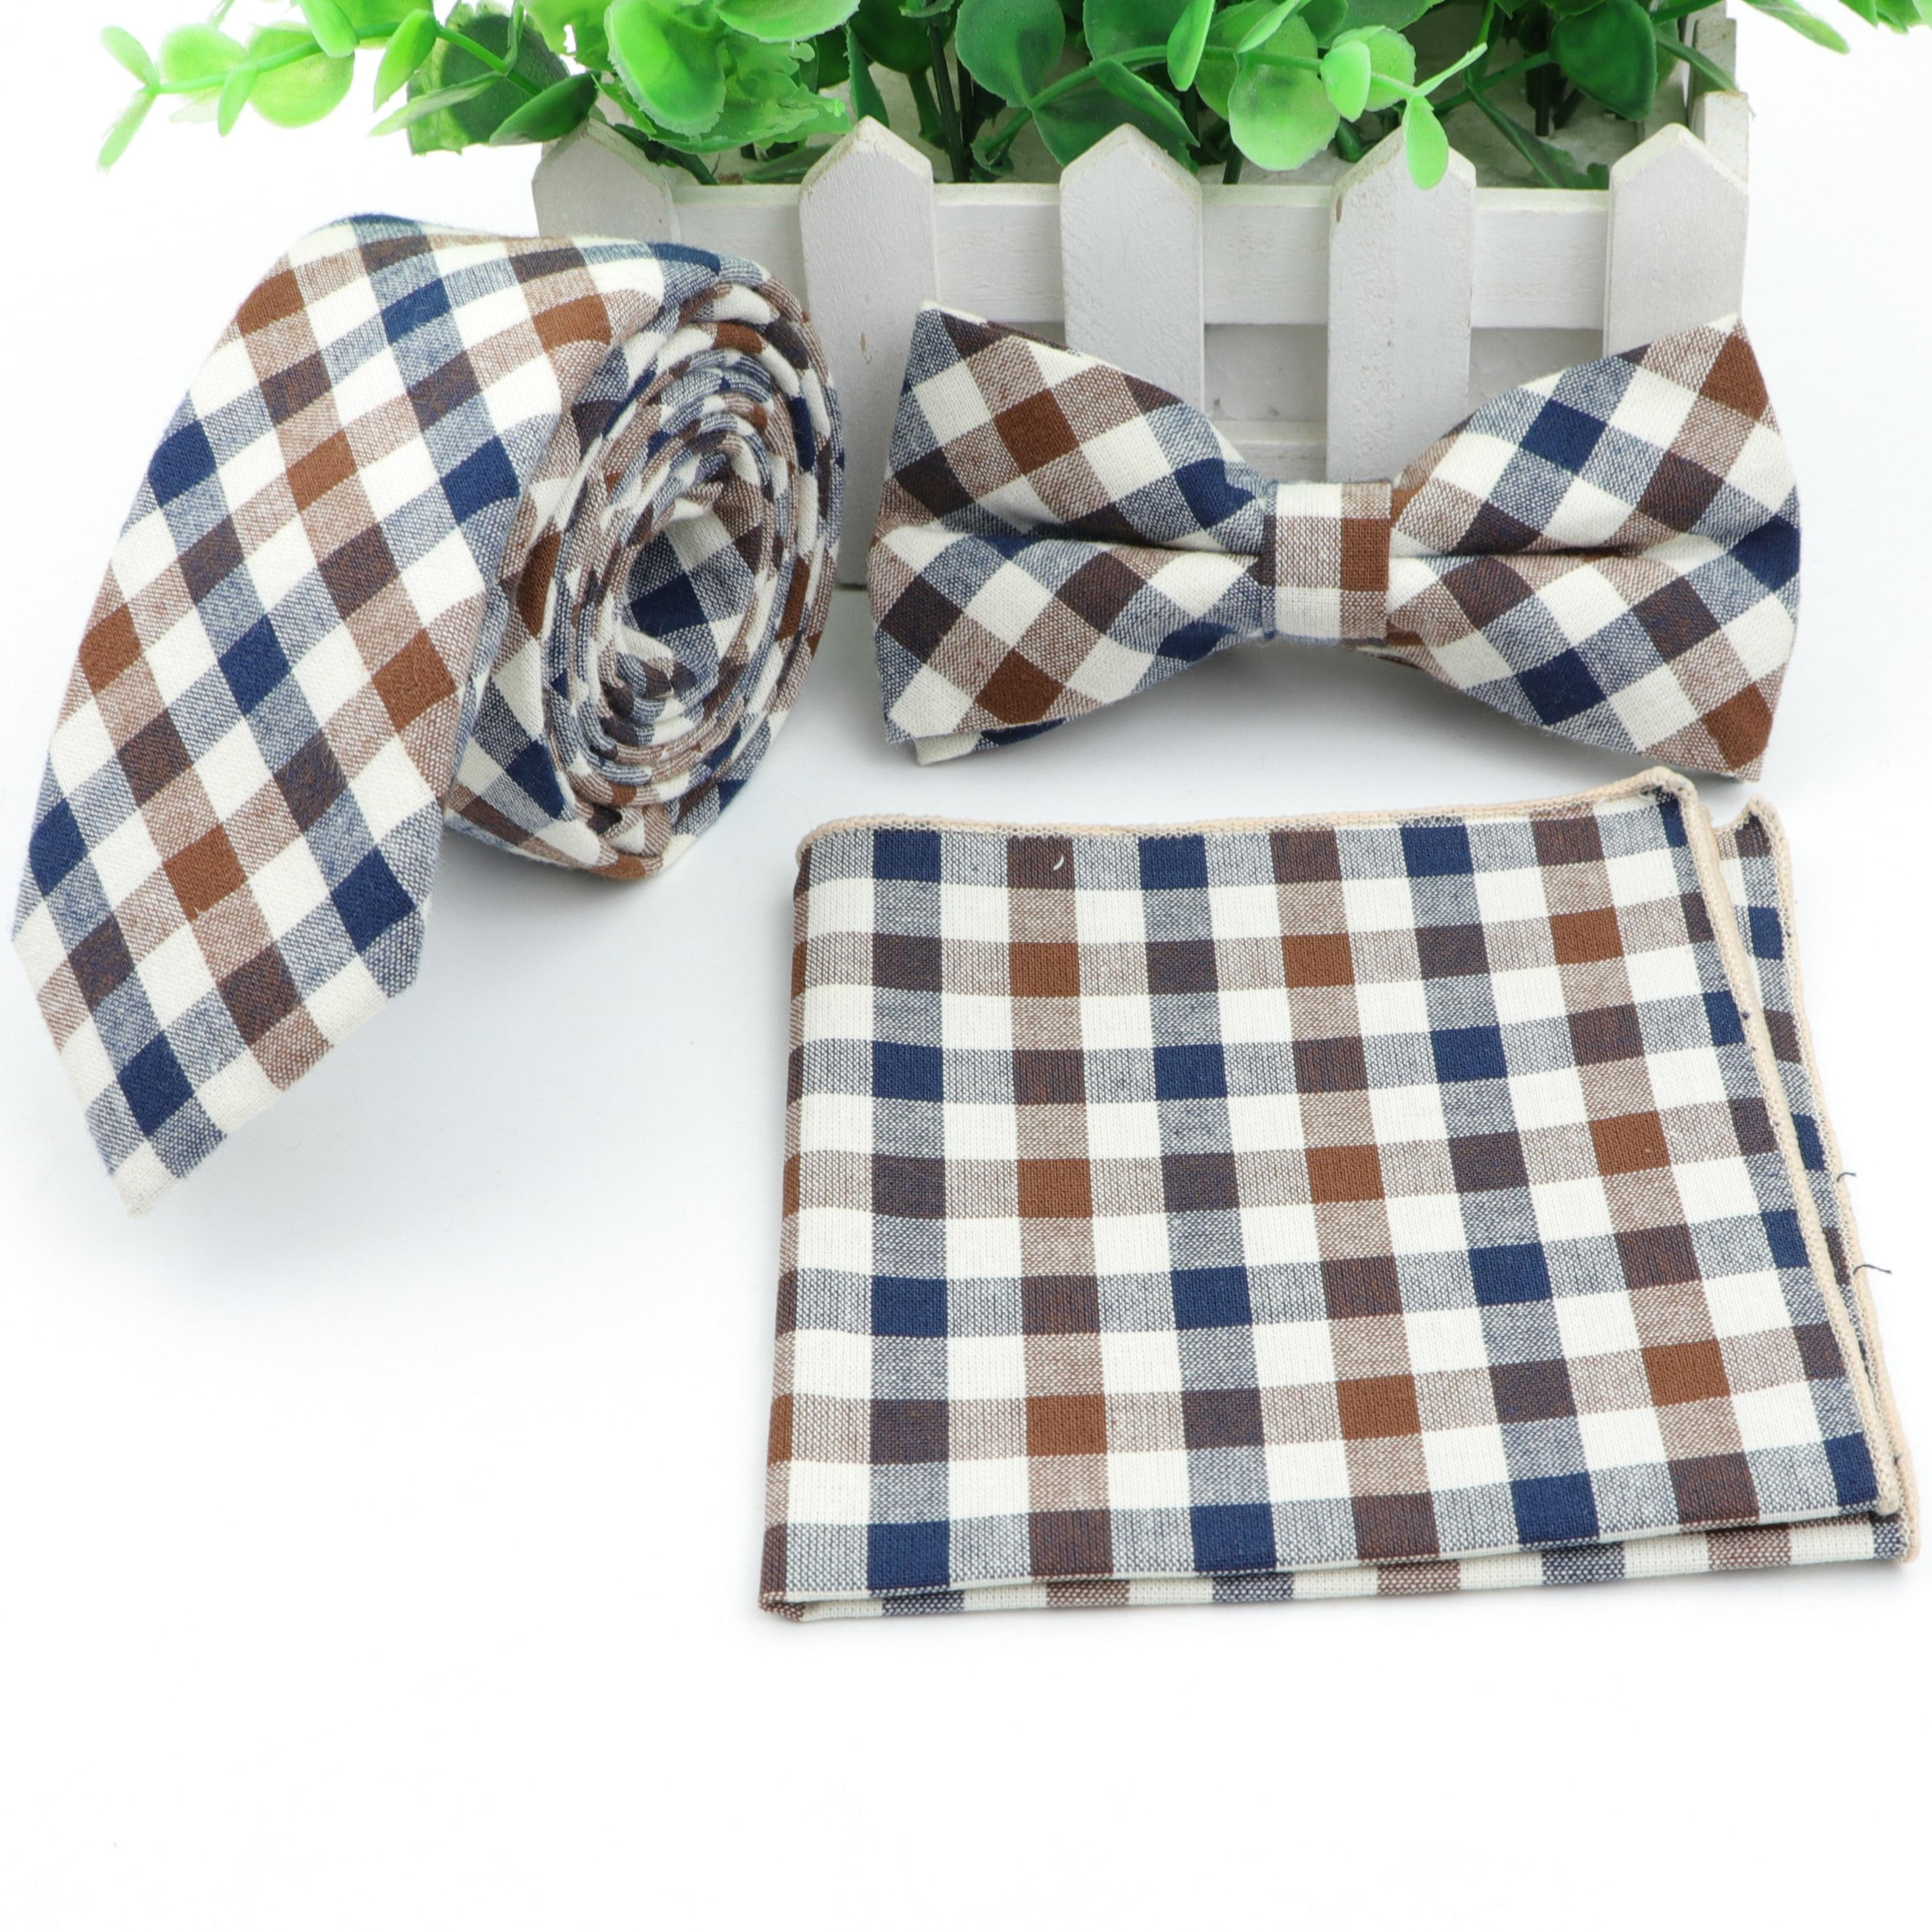 Cotton Tie Set Mens Designer Skinny Plaid Necktie Bowtie Pocket Square Suit Ties Butterfly Handkerchief Lots